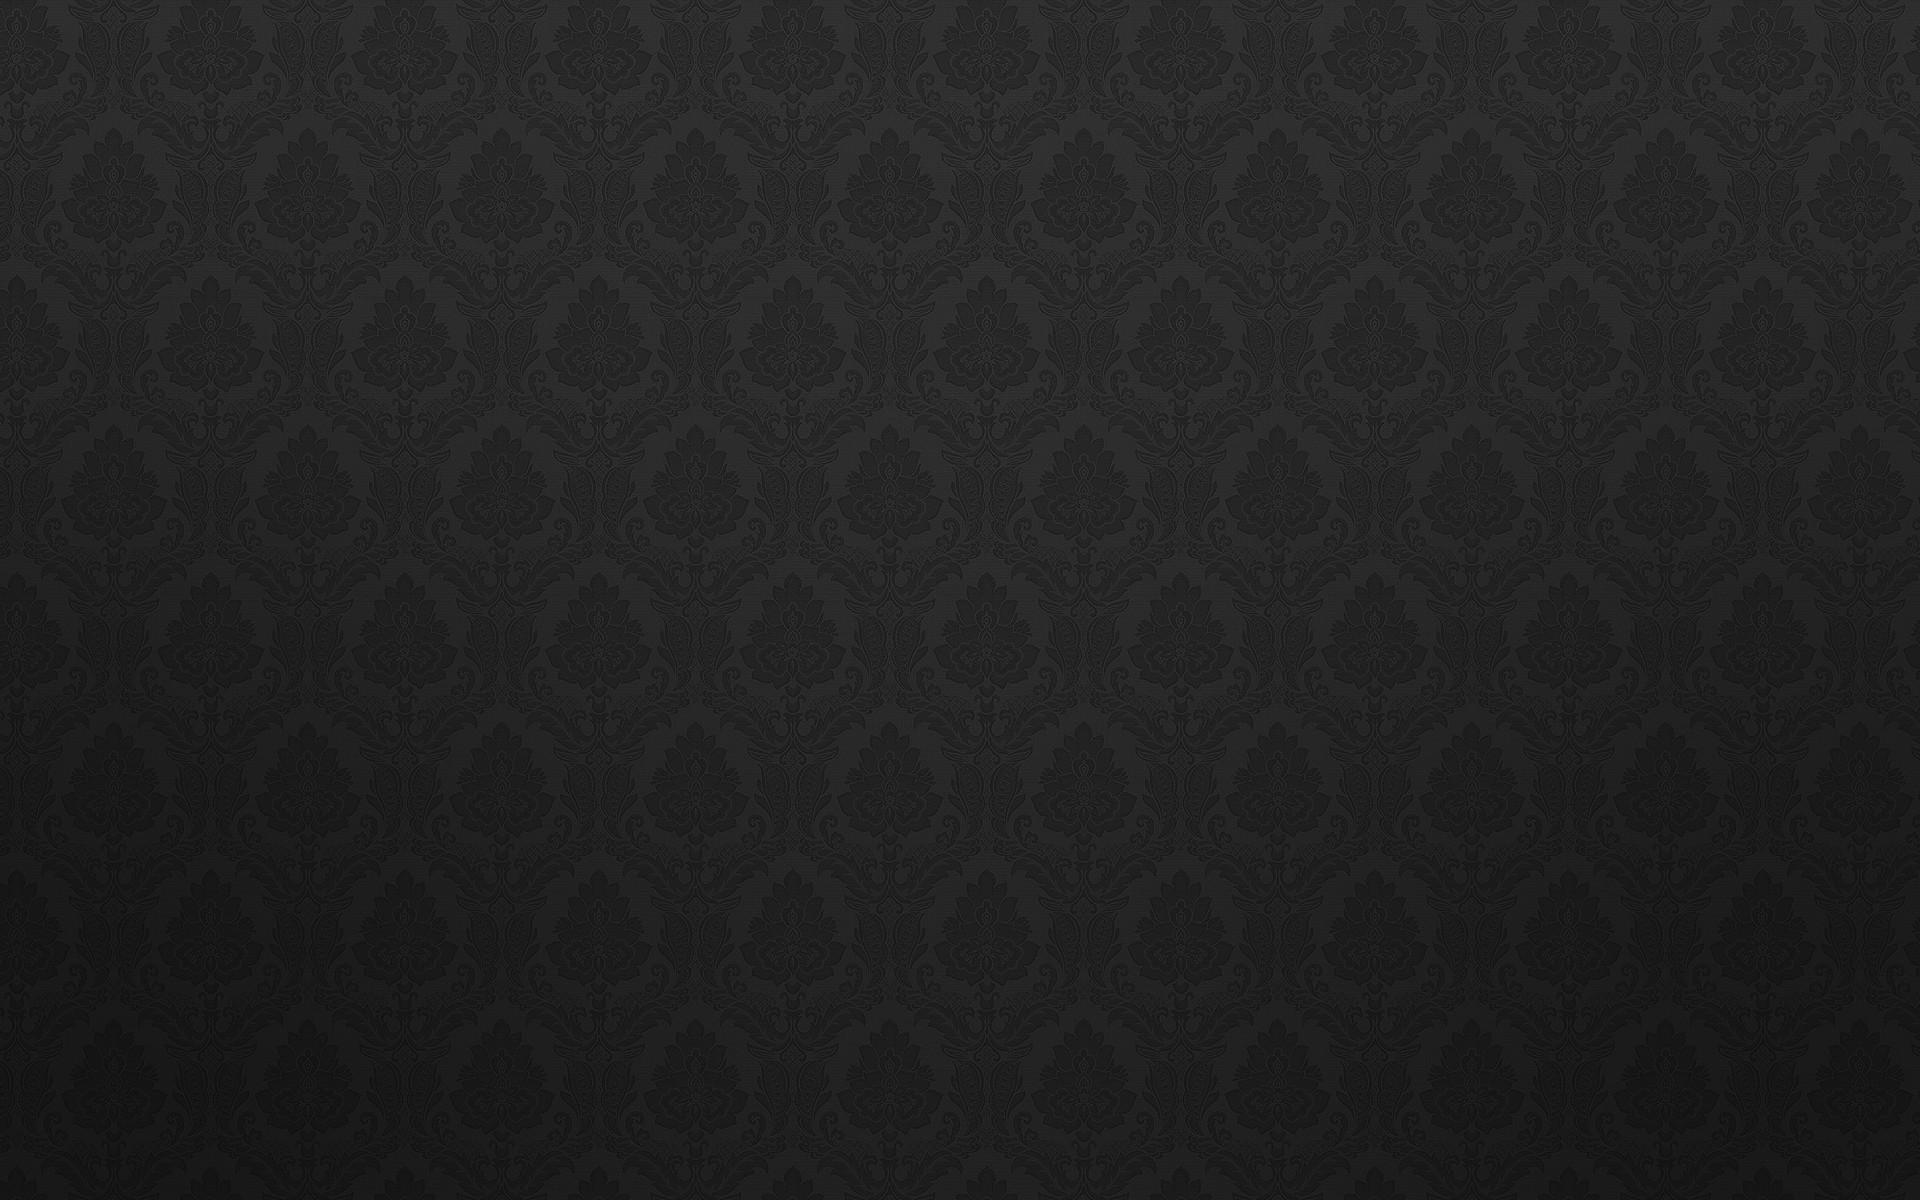 Plain Black Wallpaper 24 Desktop Wallpaper